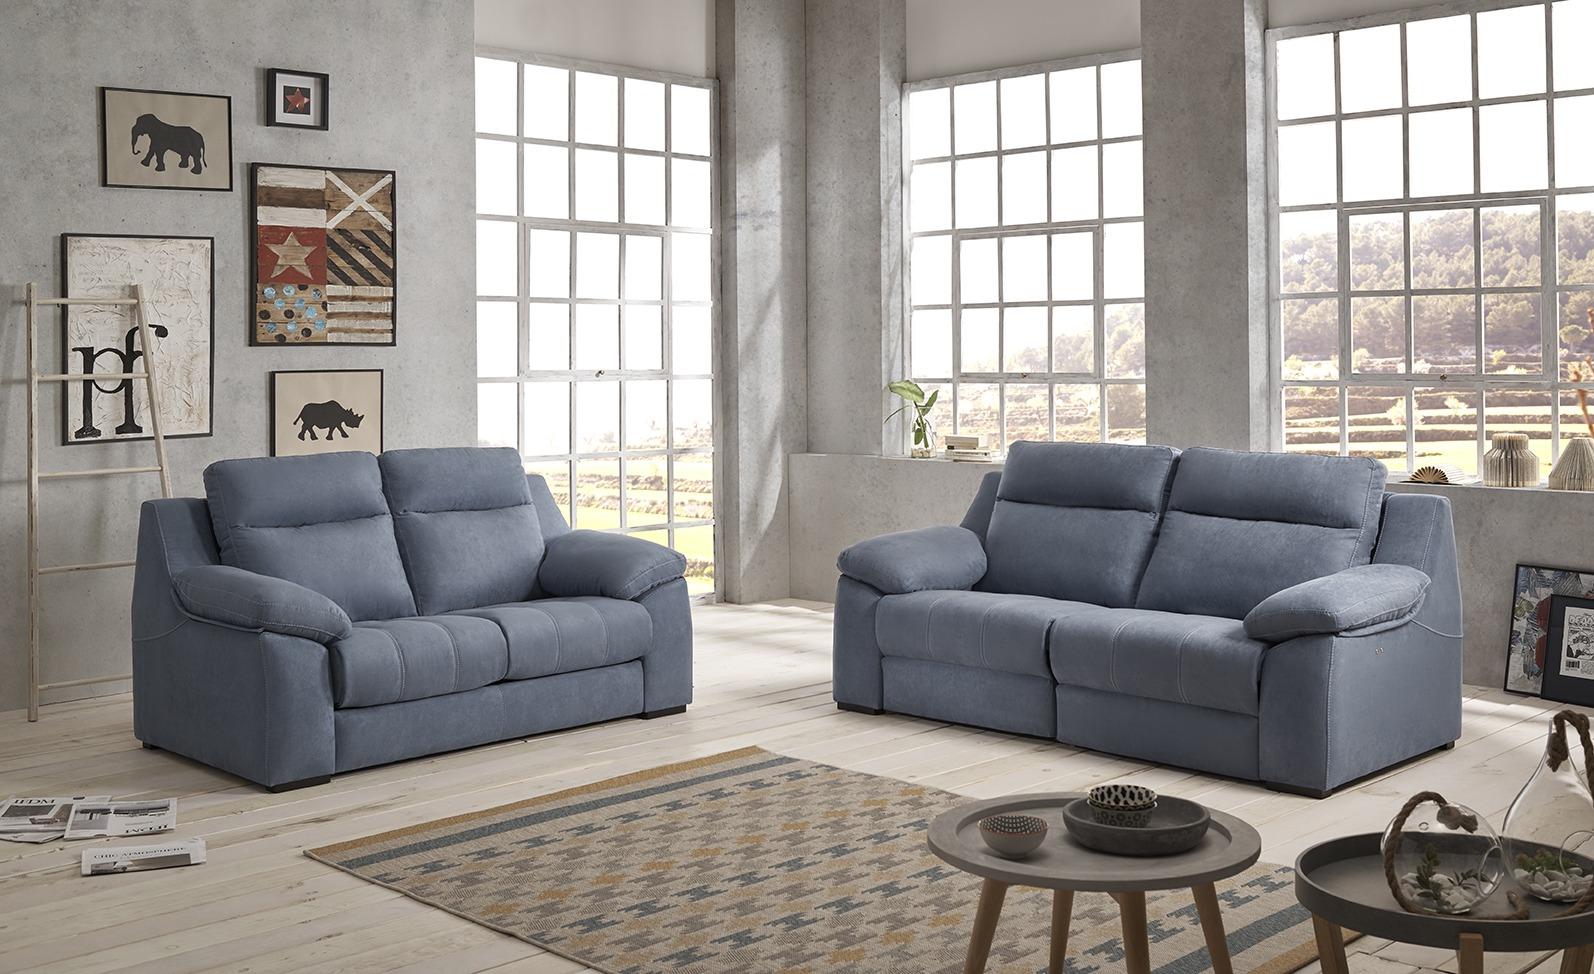 sofas-modernos-General-muebles-paco-caballero-1801-5cdfe894c5836